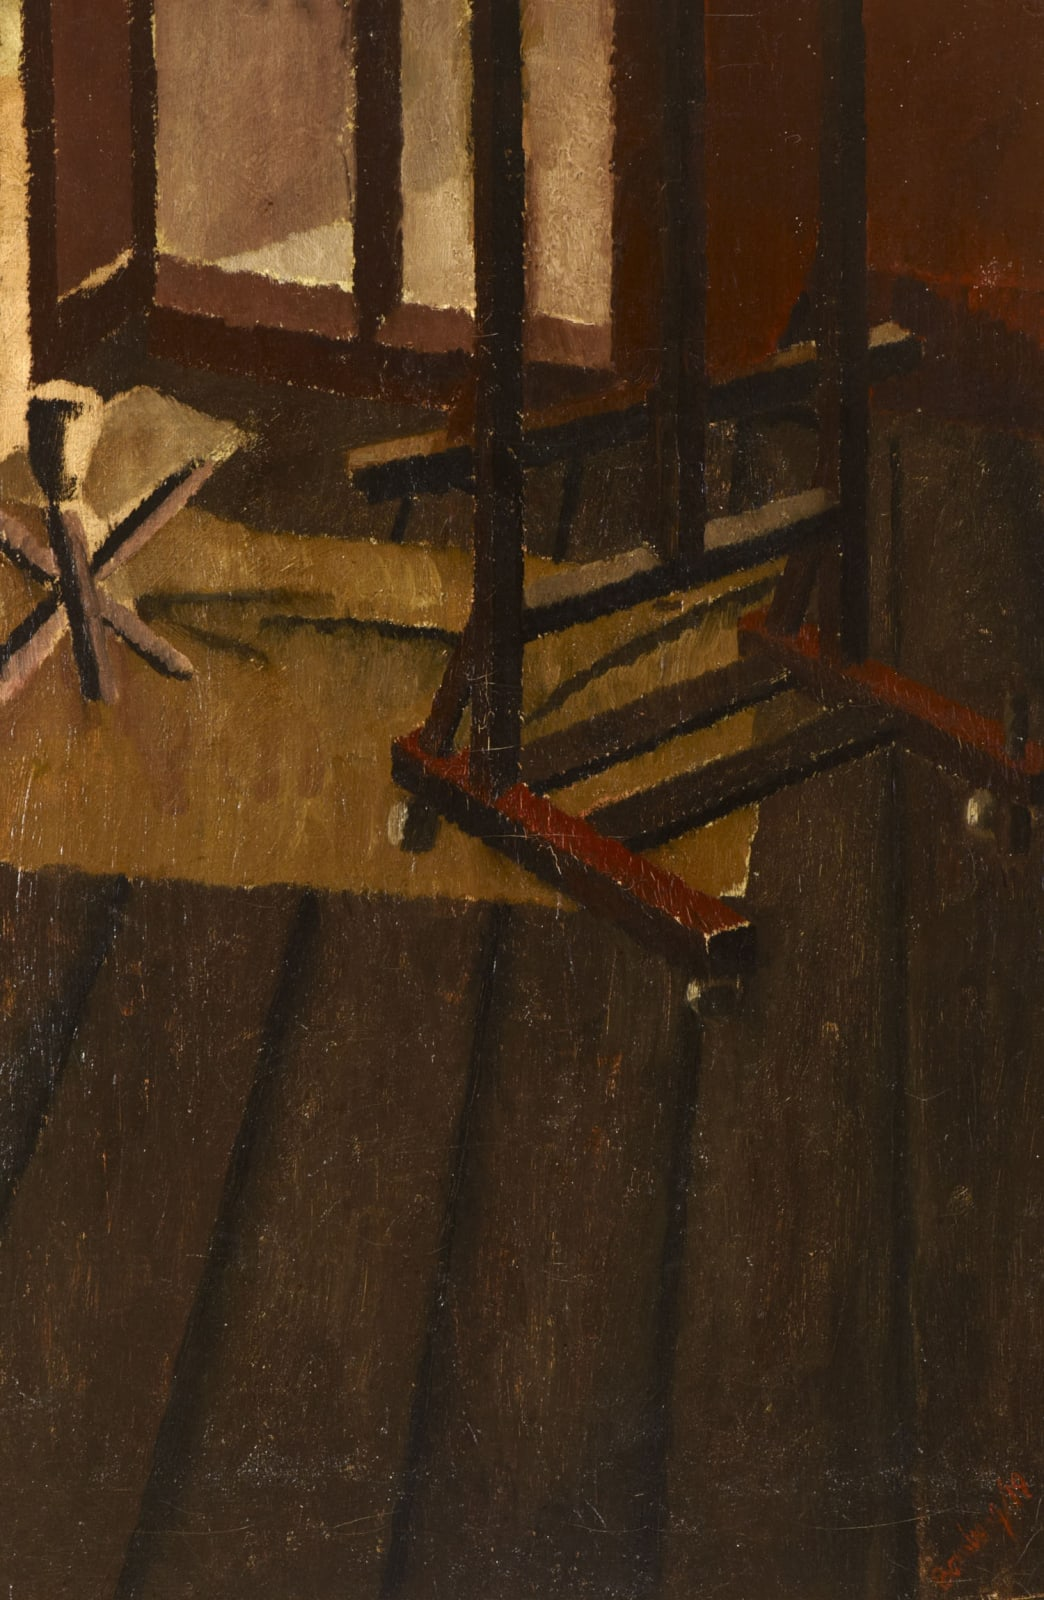 David Bomberg (1890-1957) The Studio 1919 Oil on board 74.3 x 49 cm Ben Uri Collection © David Bomberg estate